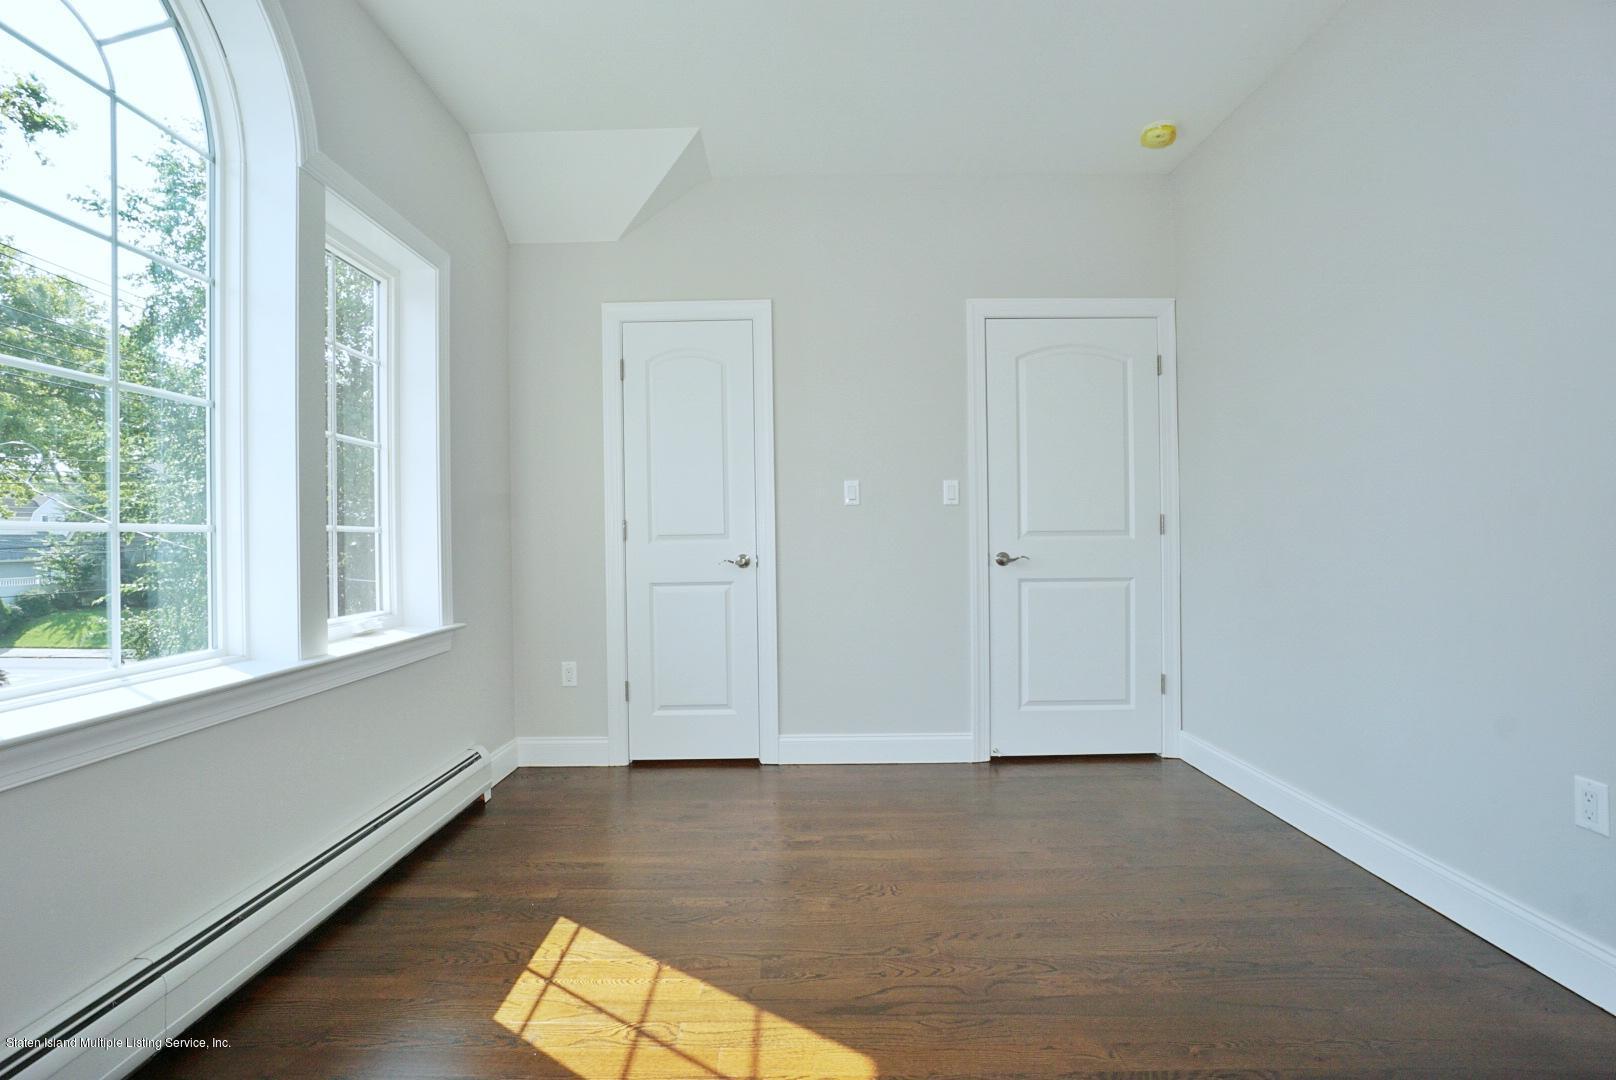 Single Family - Detached 170 Fairview Avenue  Staten Island, NY 10314, MLS-1126684-52